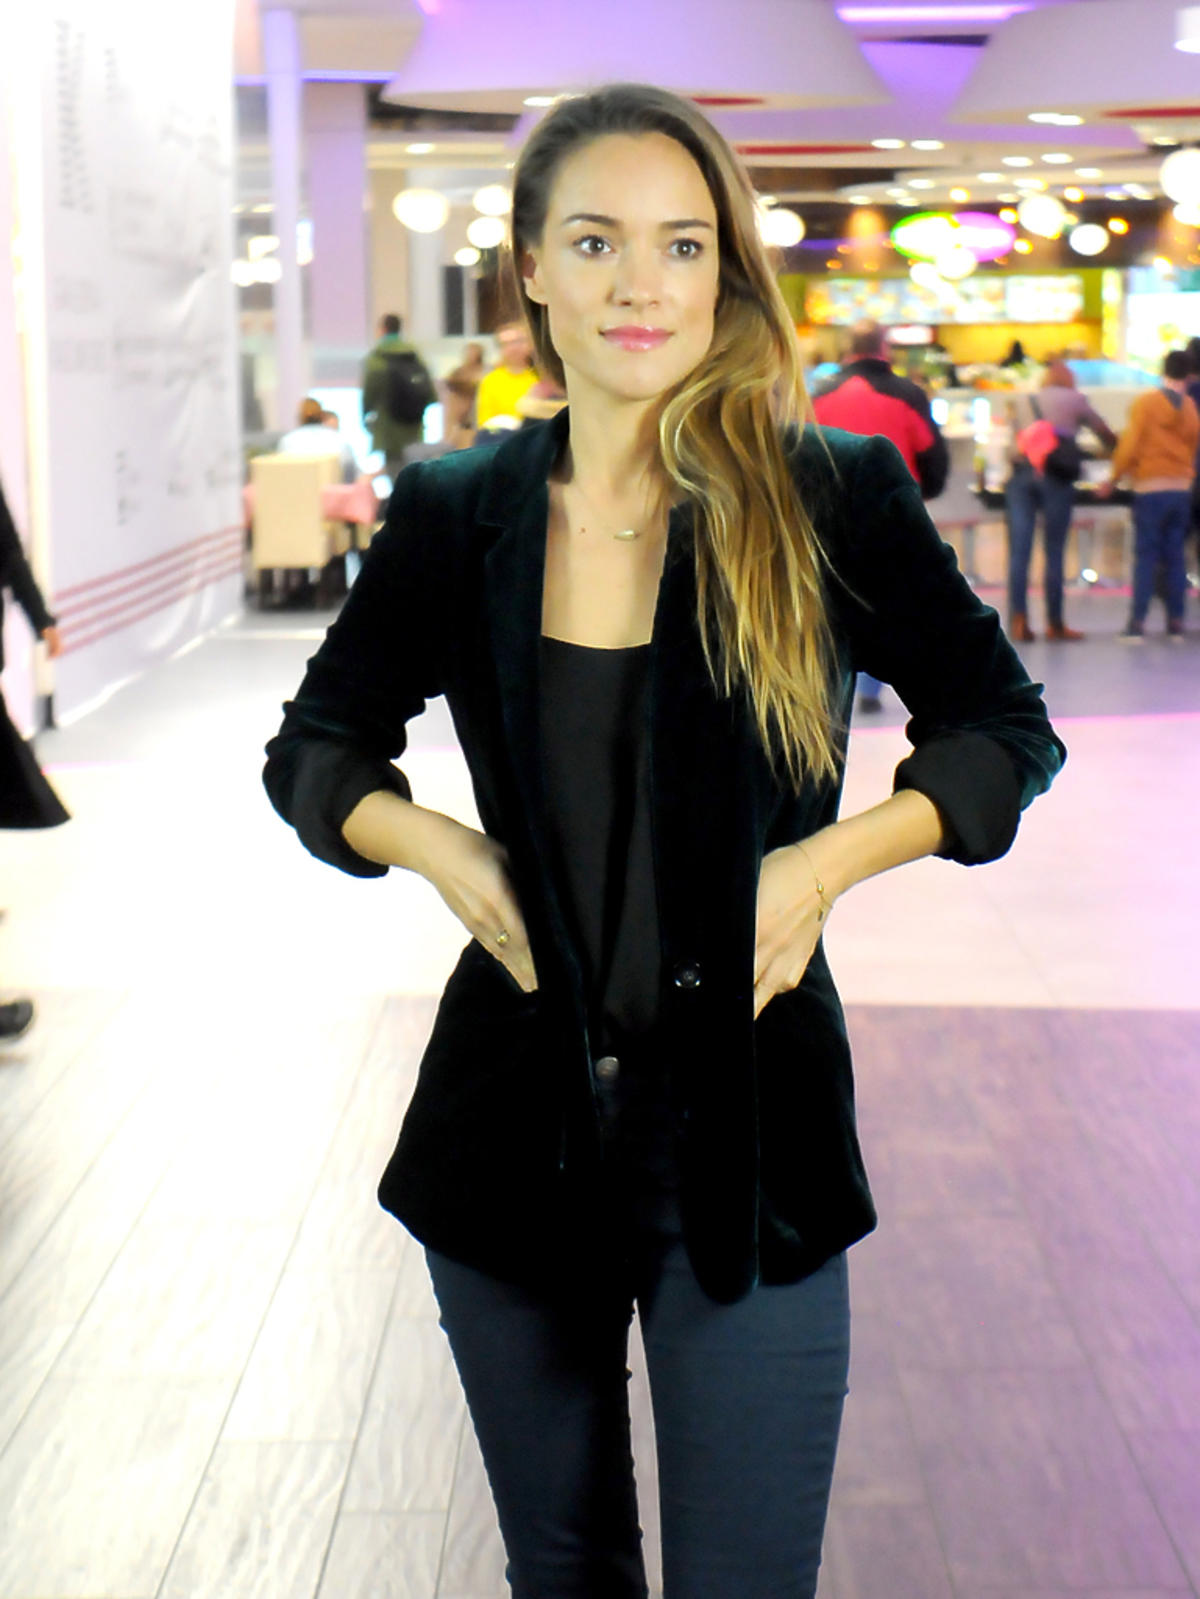 Alicja Bachleda Curuś promuje film